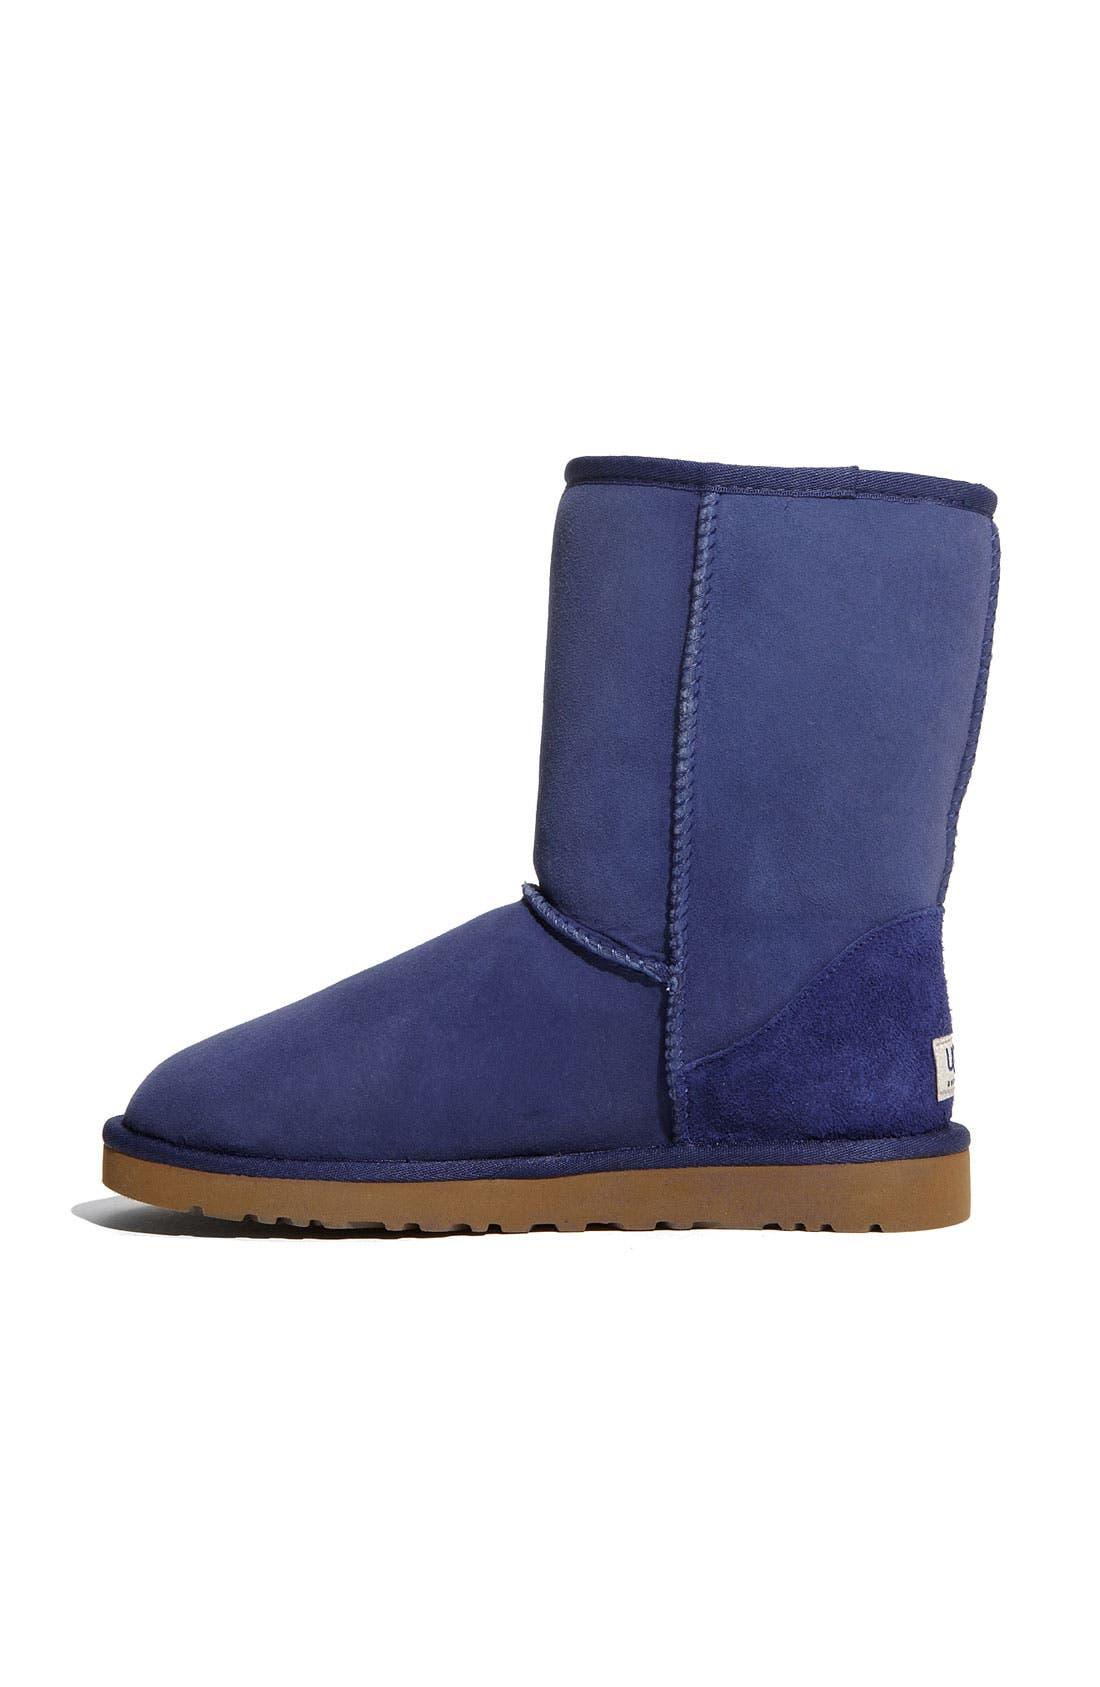 Alternate Image 2  - UGG® 'Classic Short' Boot (Women)